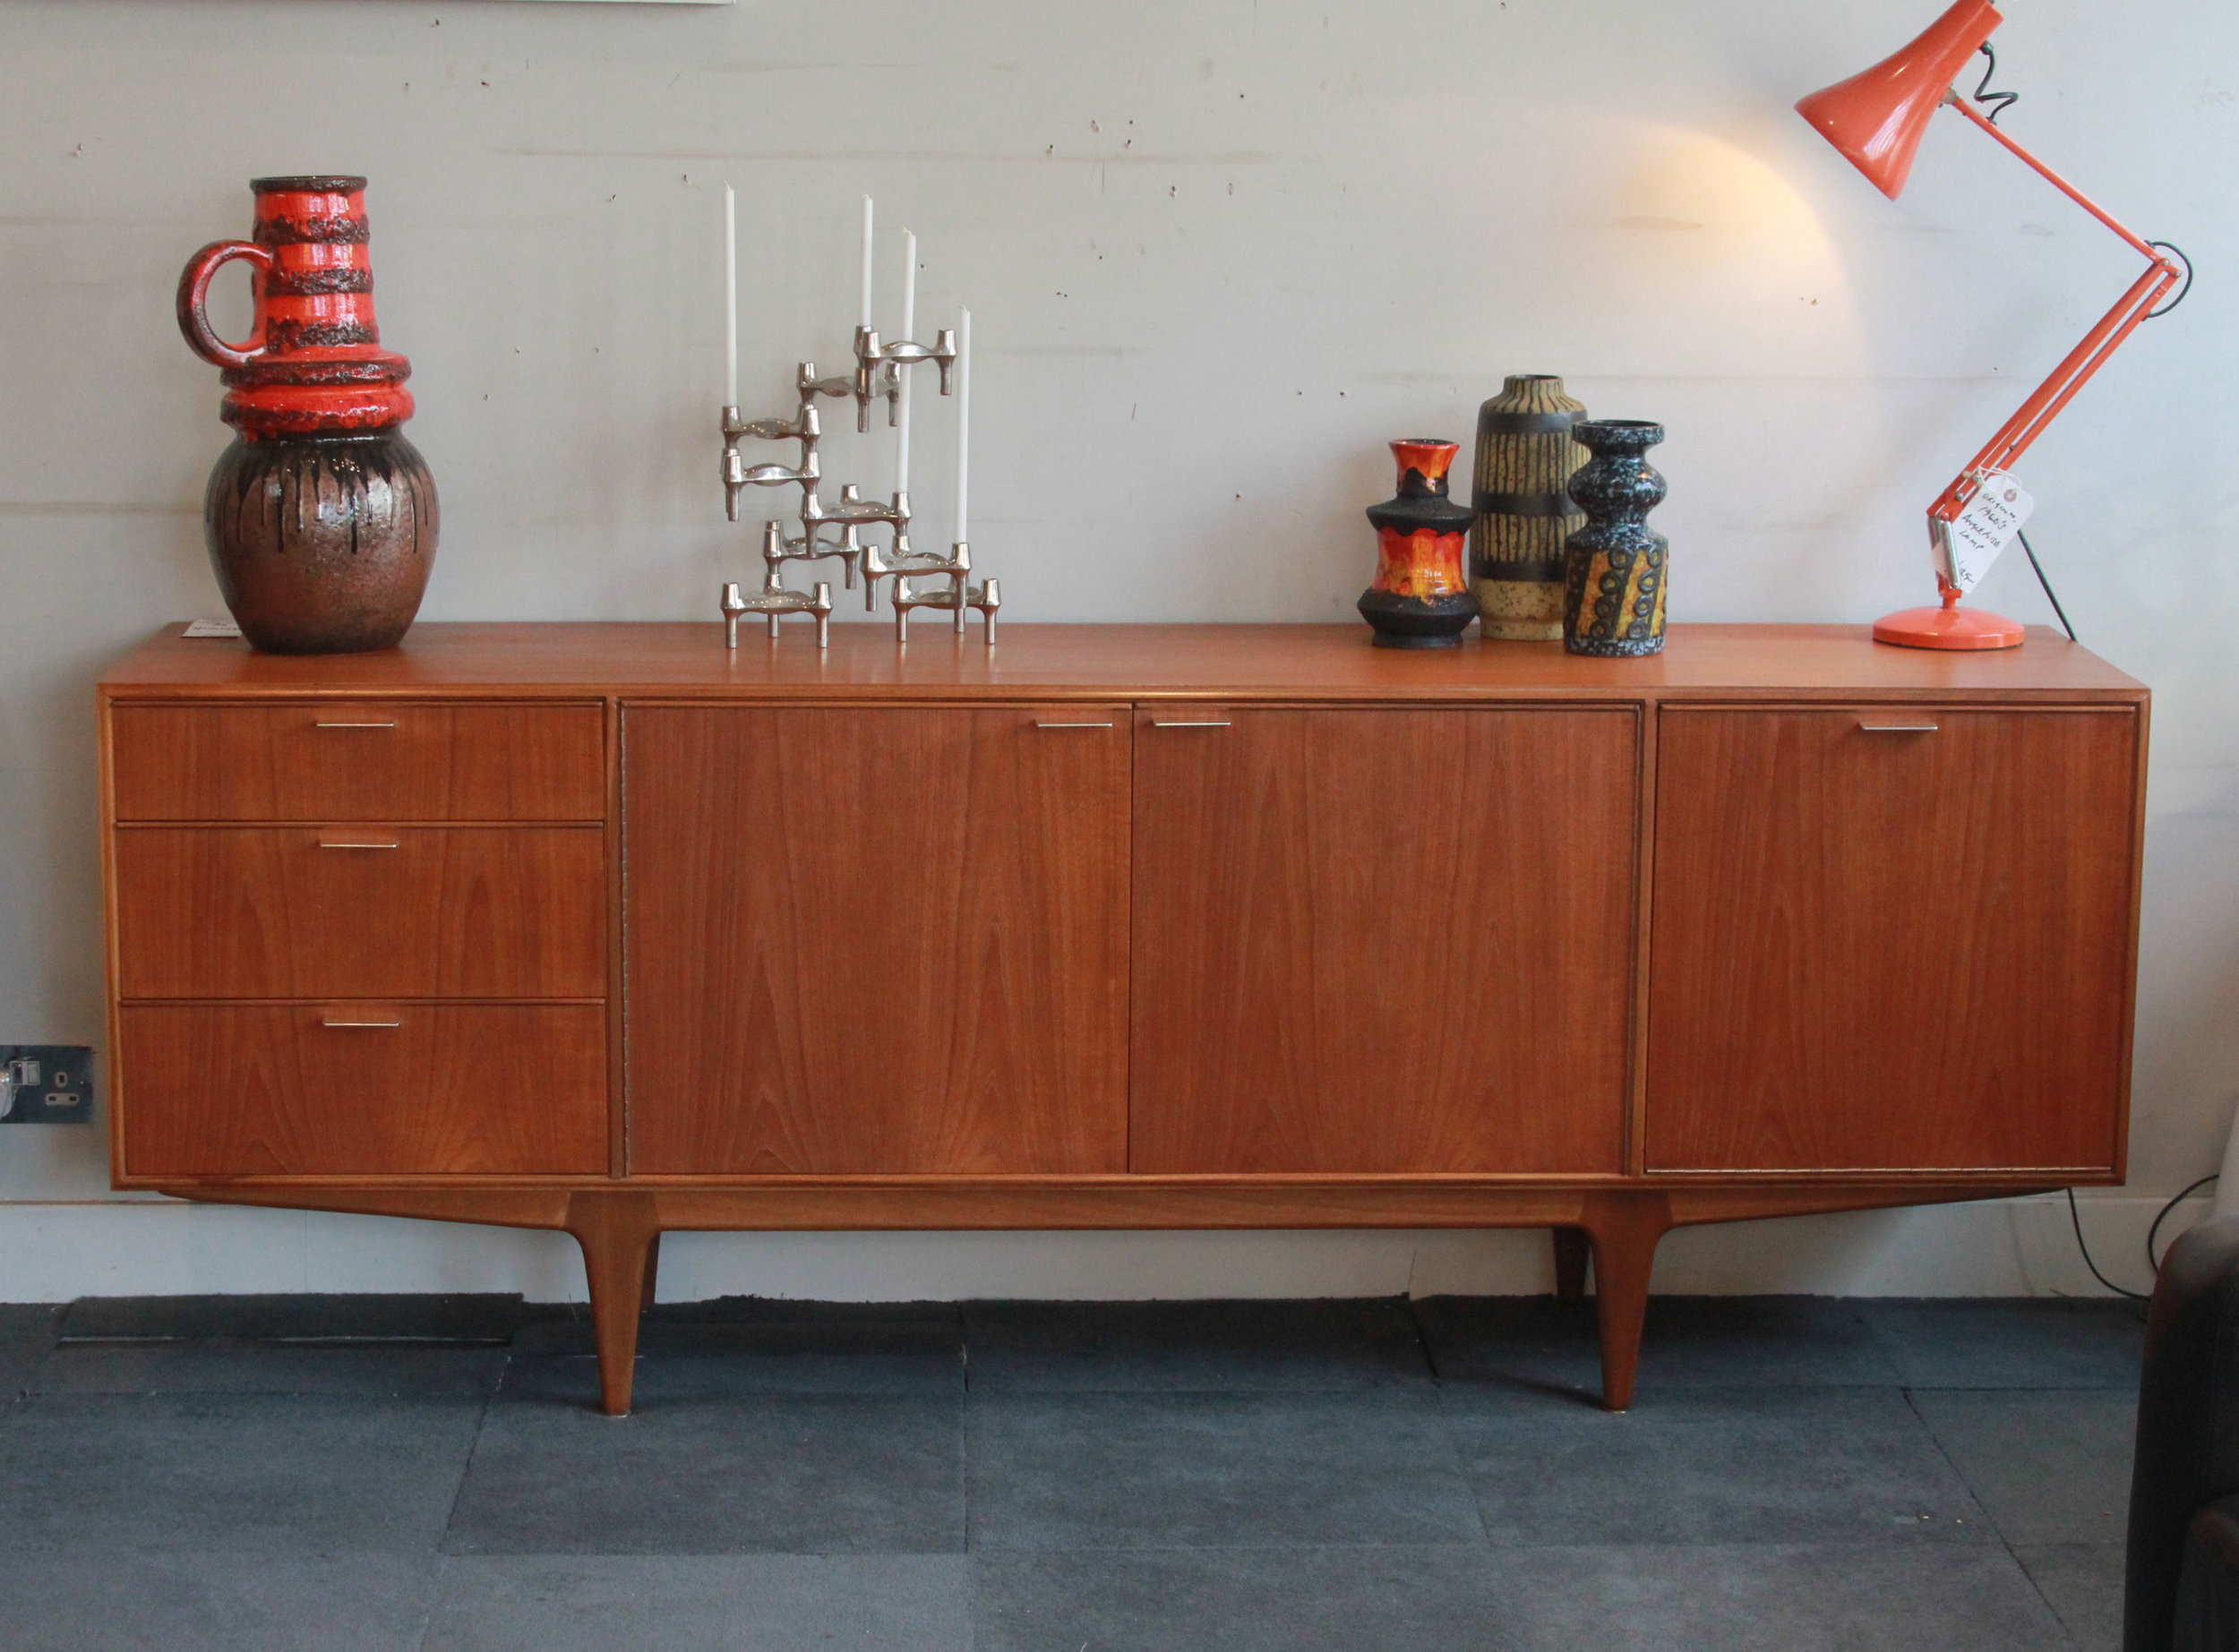 SOLD  -   teak sideboard by mckintosh of kilkardy £475.